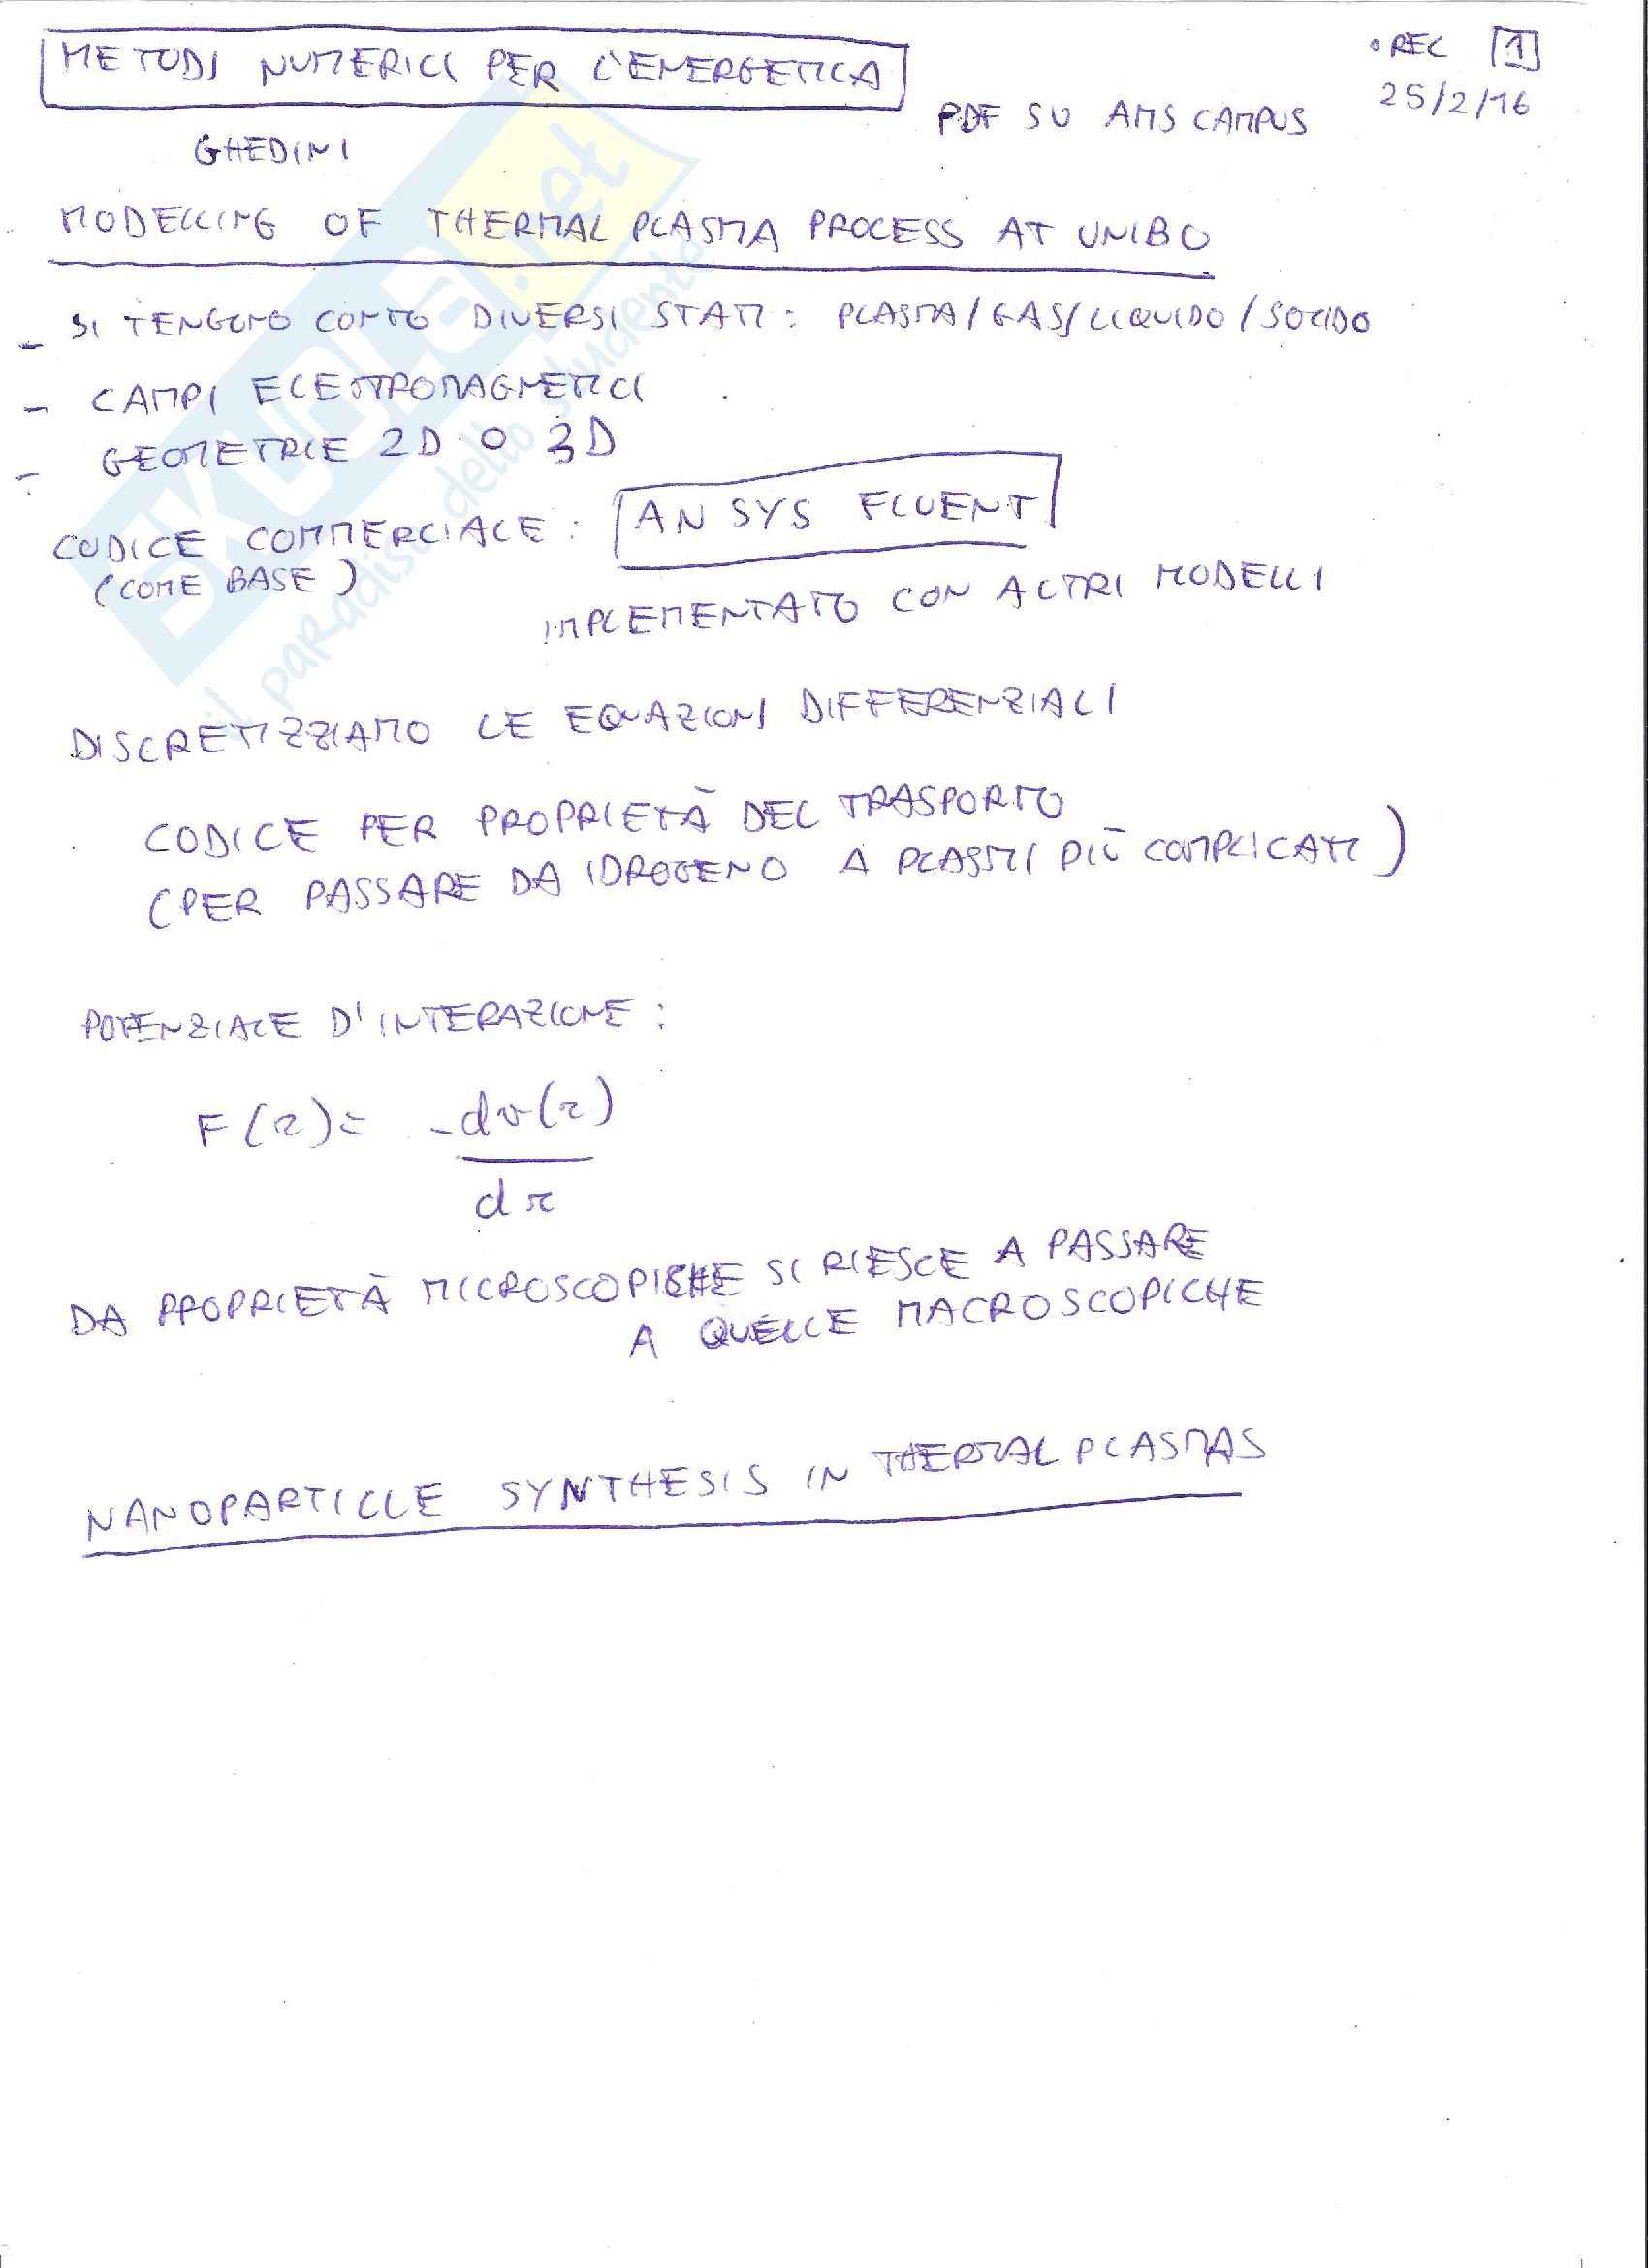 Metodi Numerici per l'Energetica M - Appunto